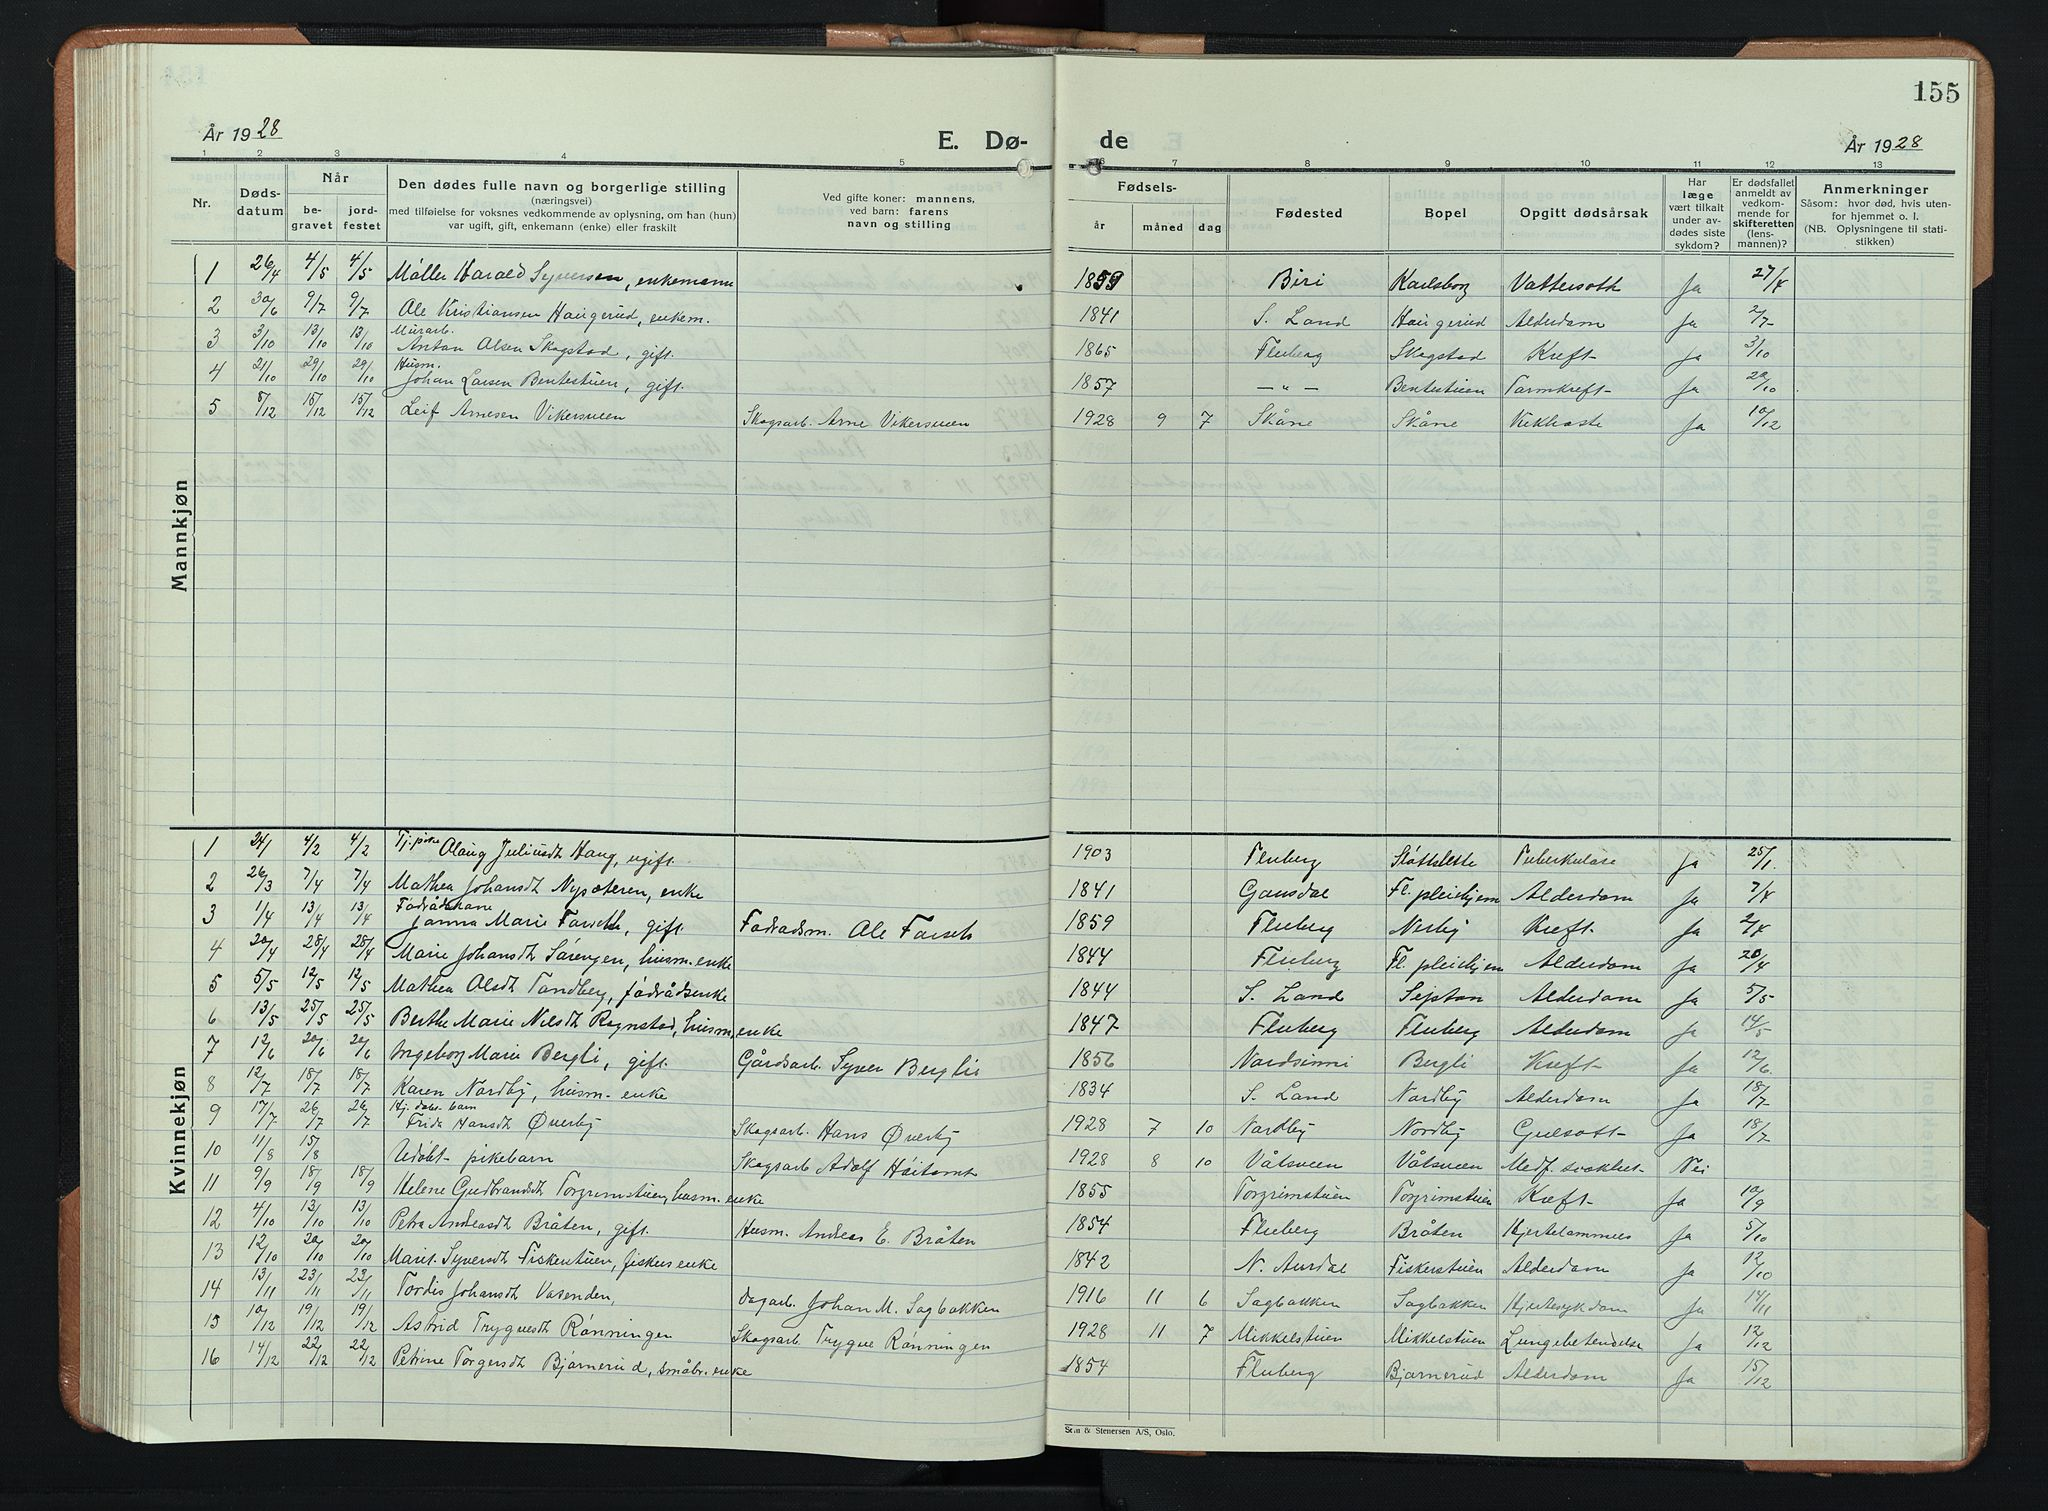 SAH, Søndre Land prestekontor, L/L0008: Klokkerbok nr. 8, 1926-1950, s. 155